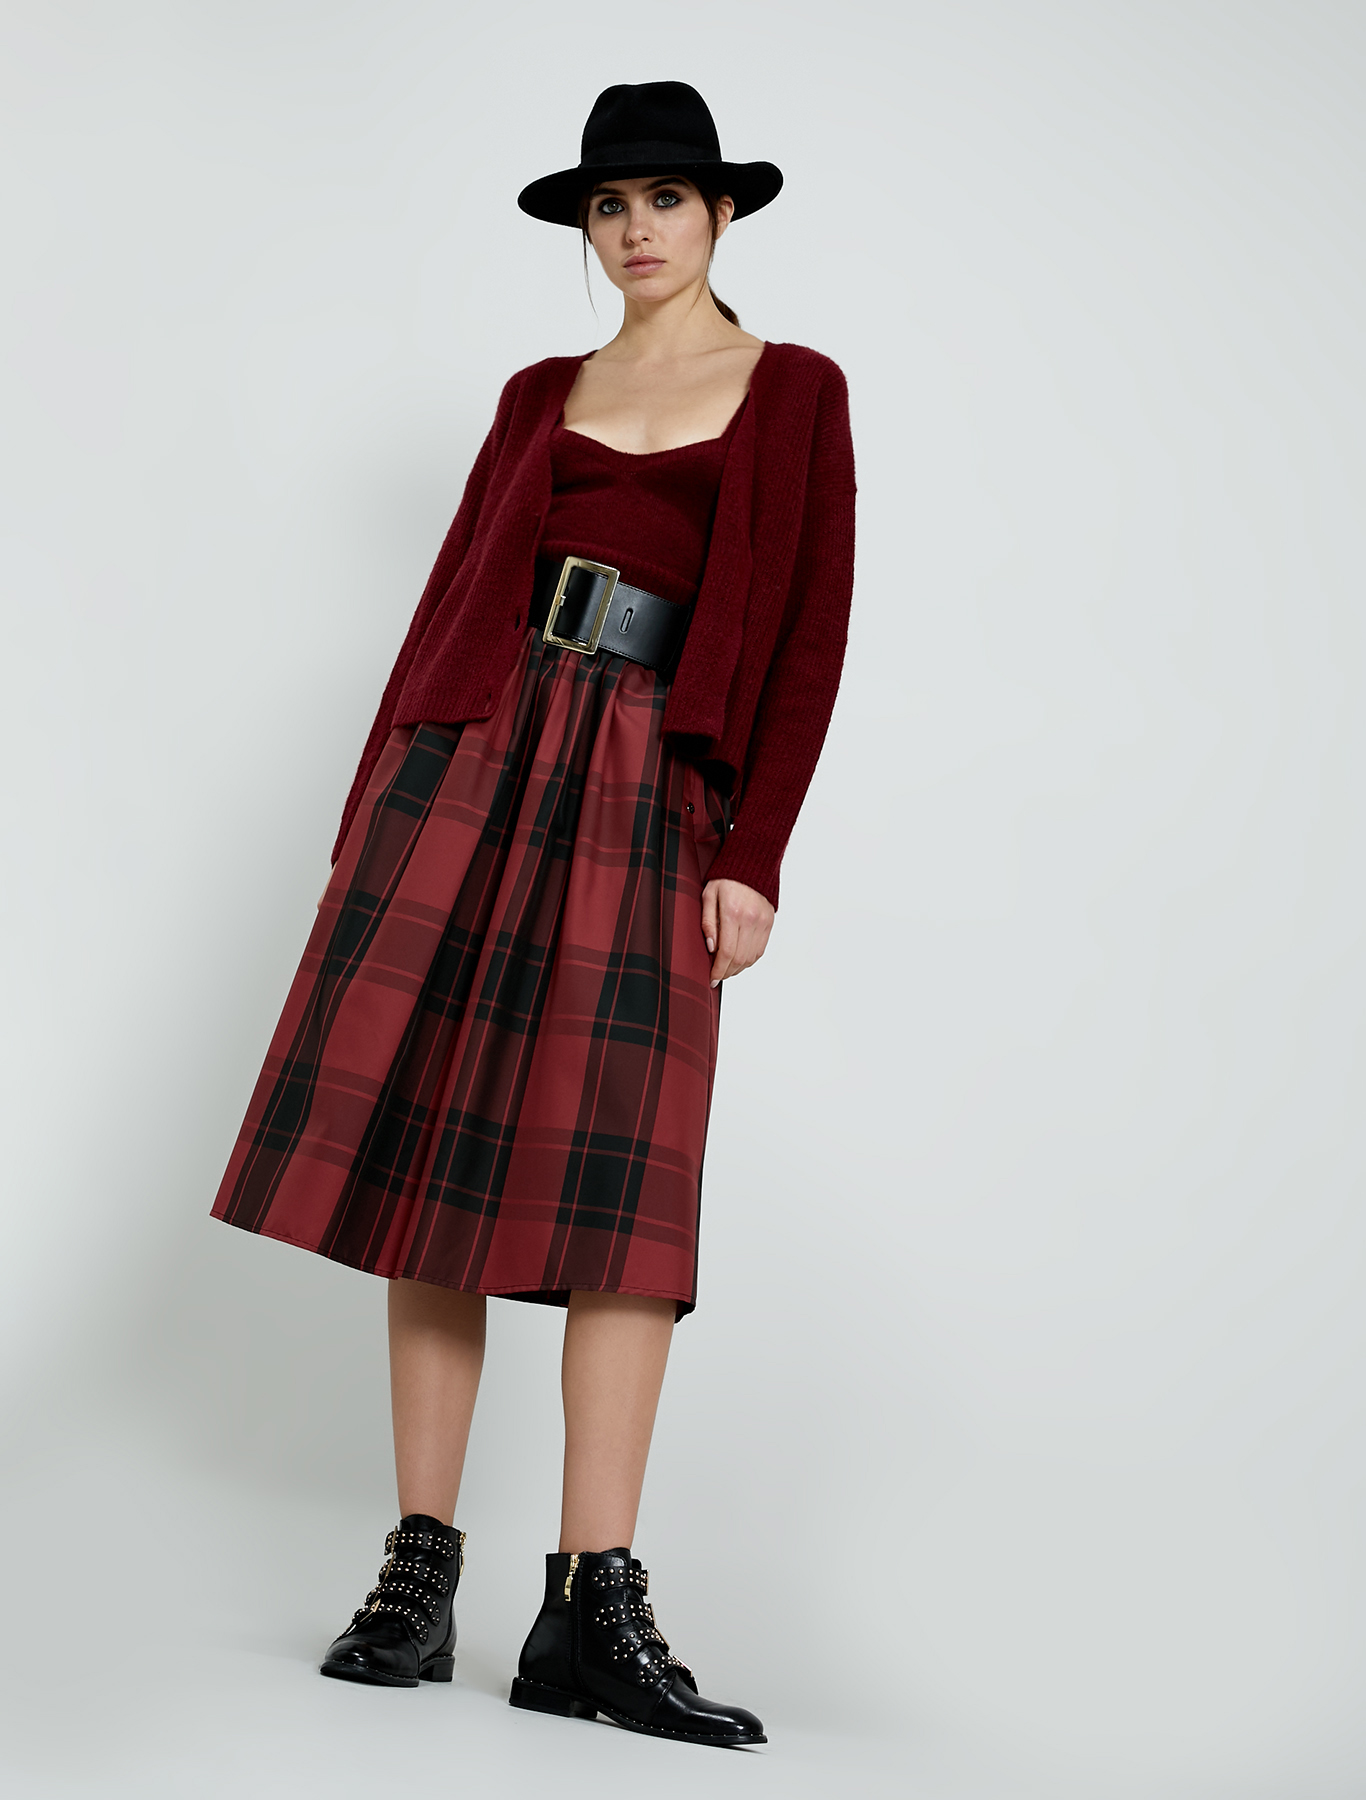 Checked taffeta skirt - burgundy - pennyblack